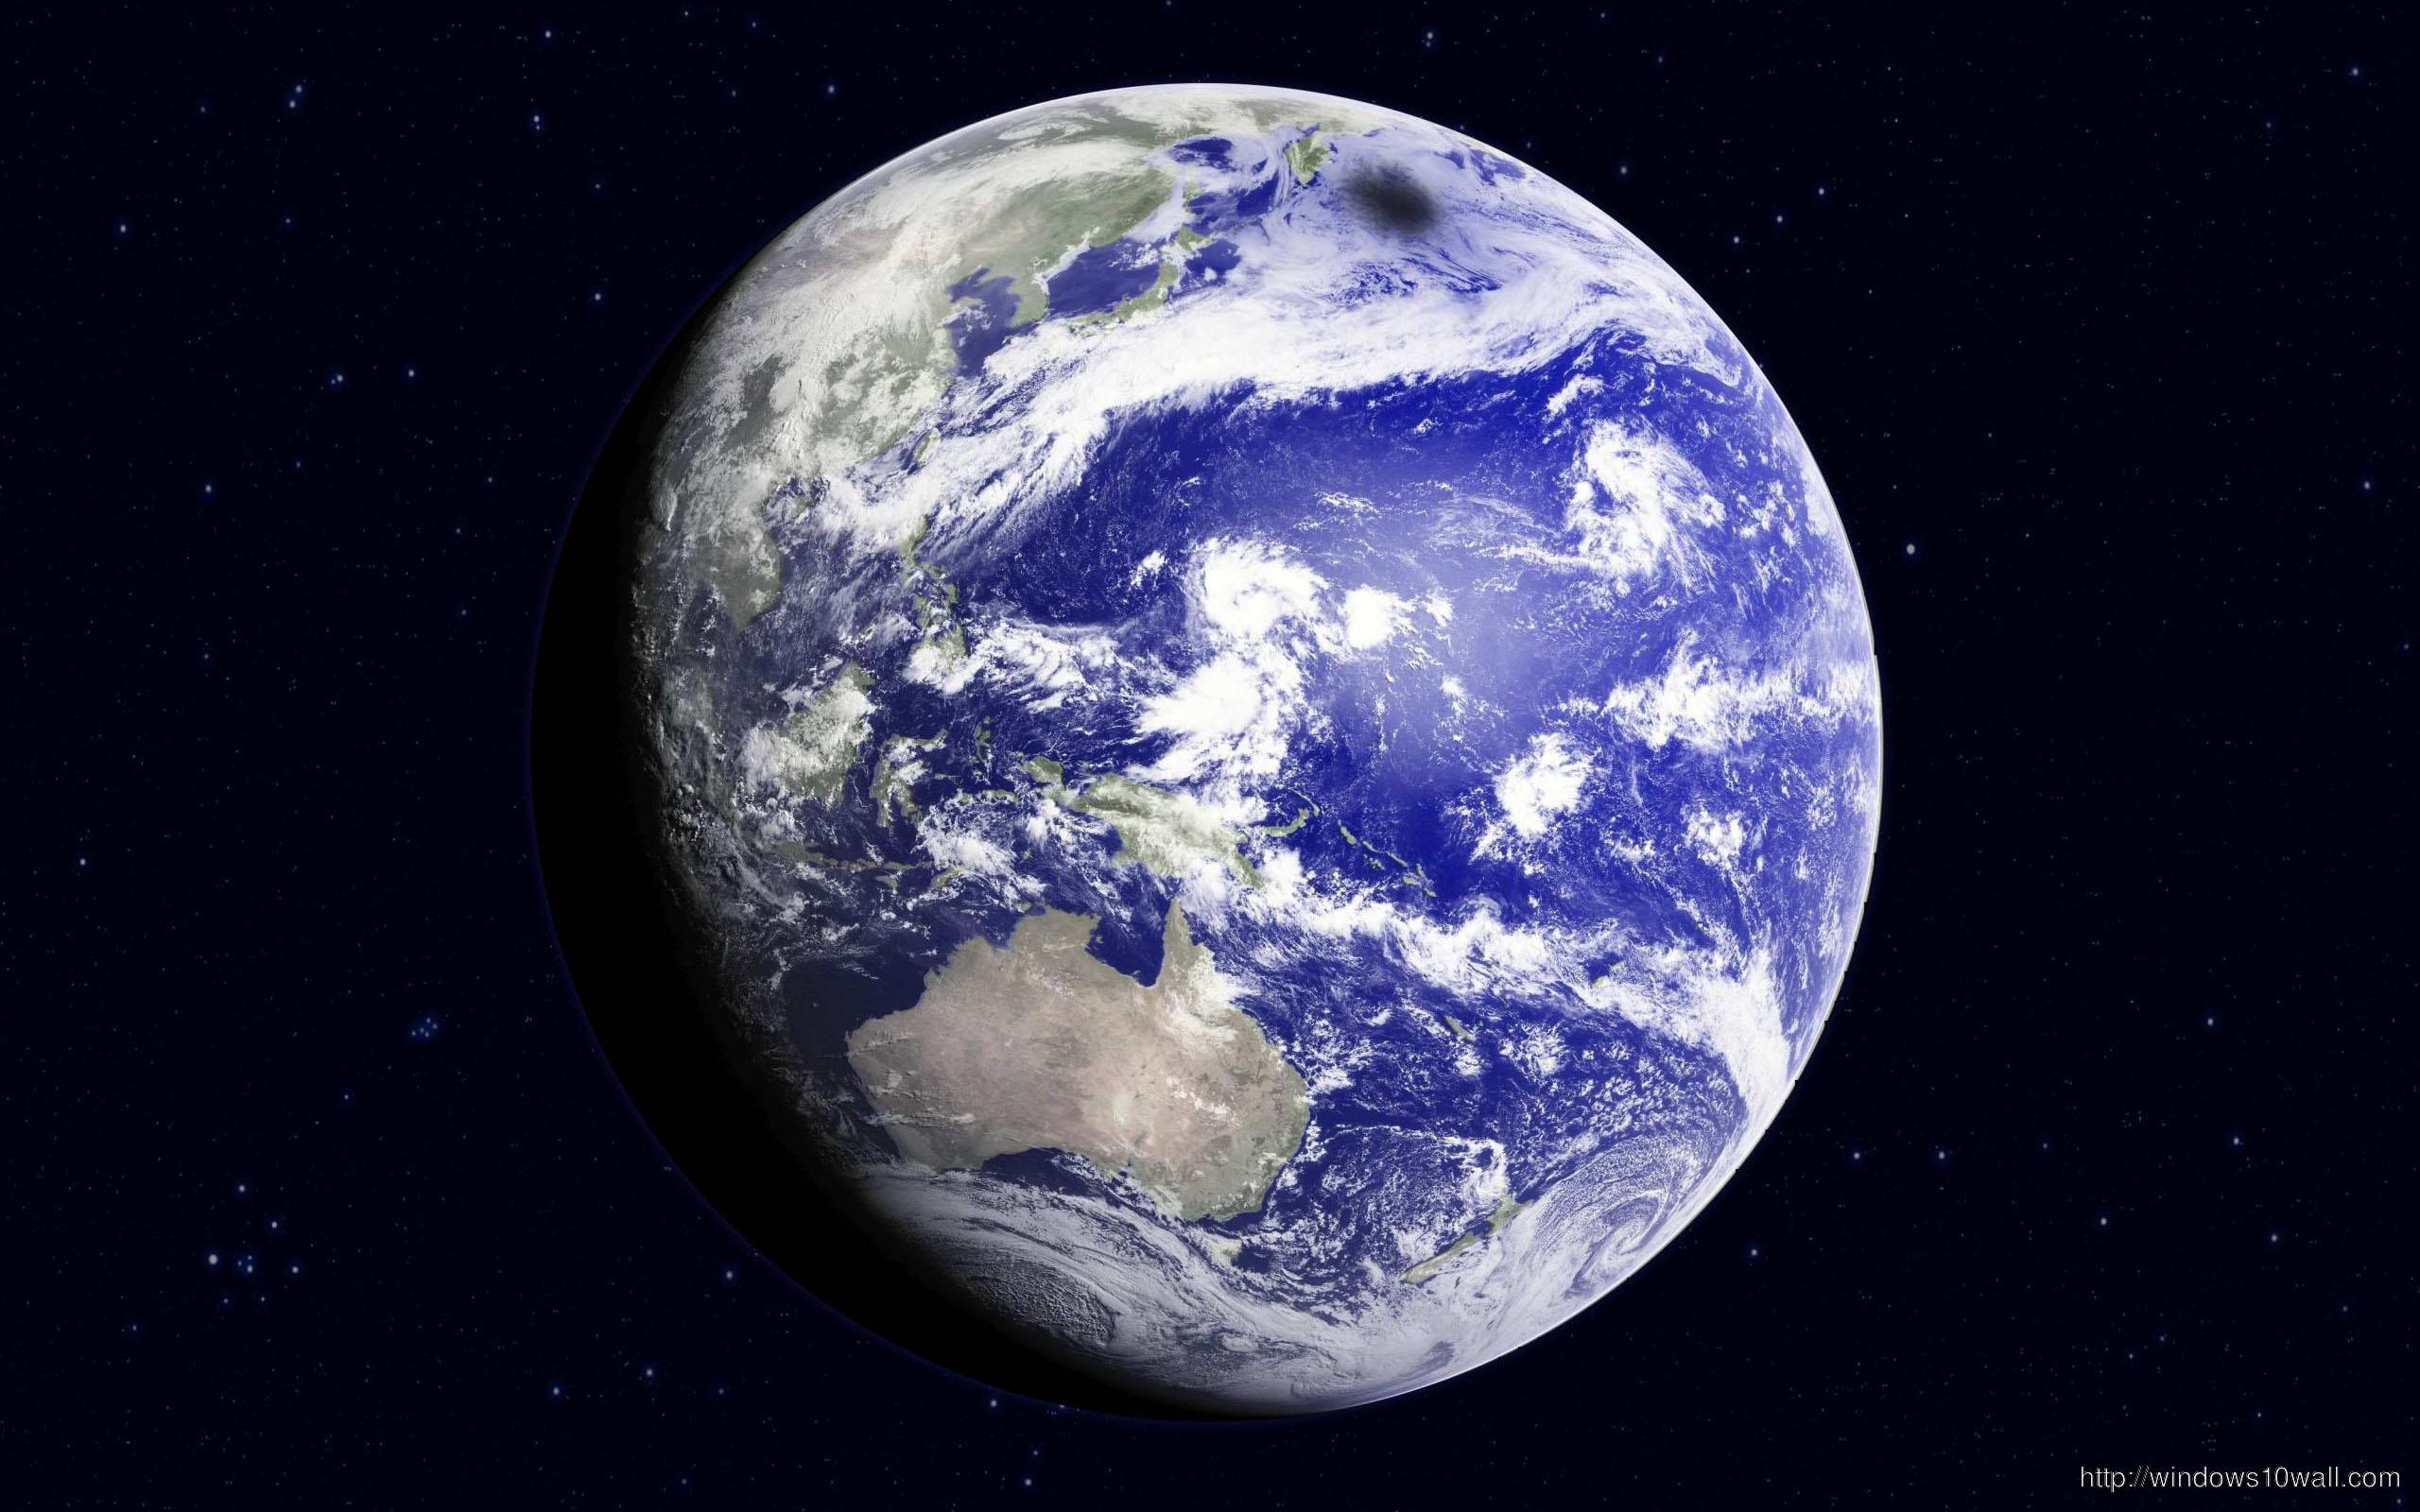 windows 10 earth -#main